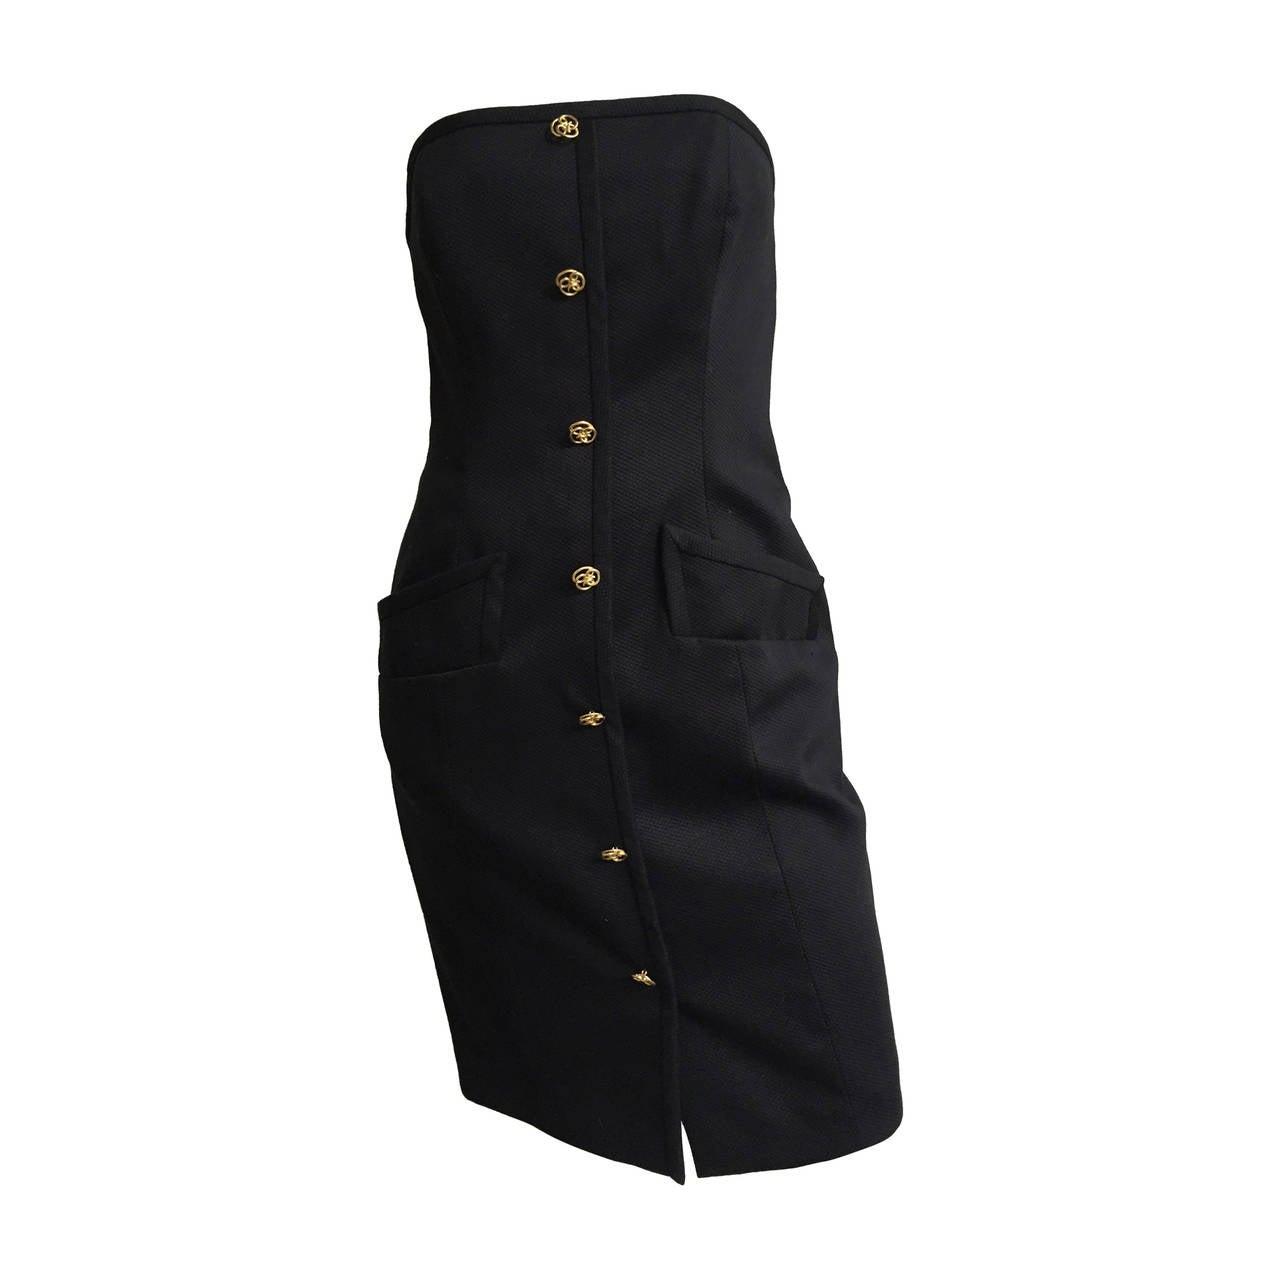 Bill Blass 90s Black Strapless Dress With Pockets Size 4. 1